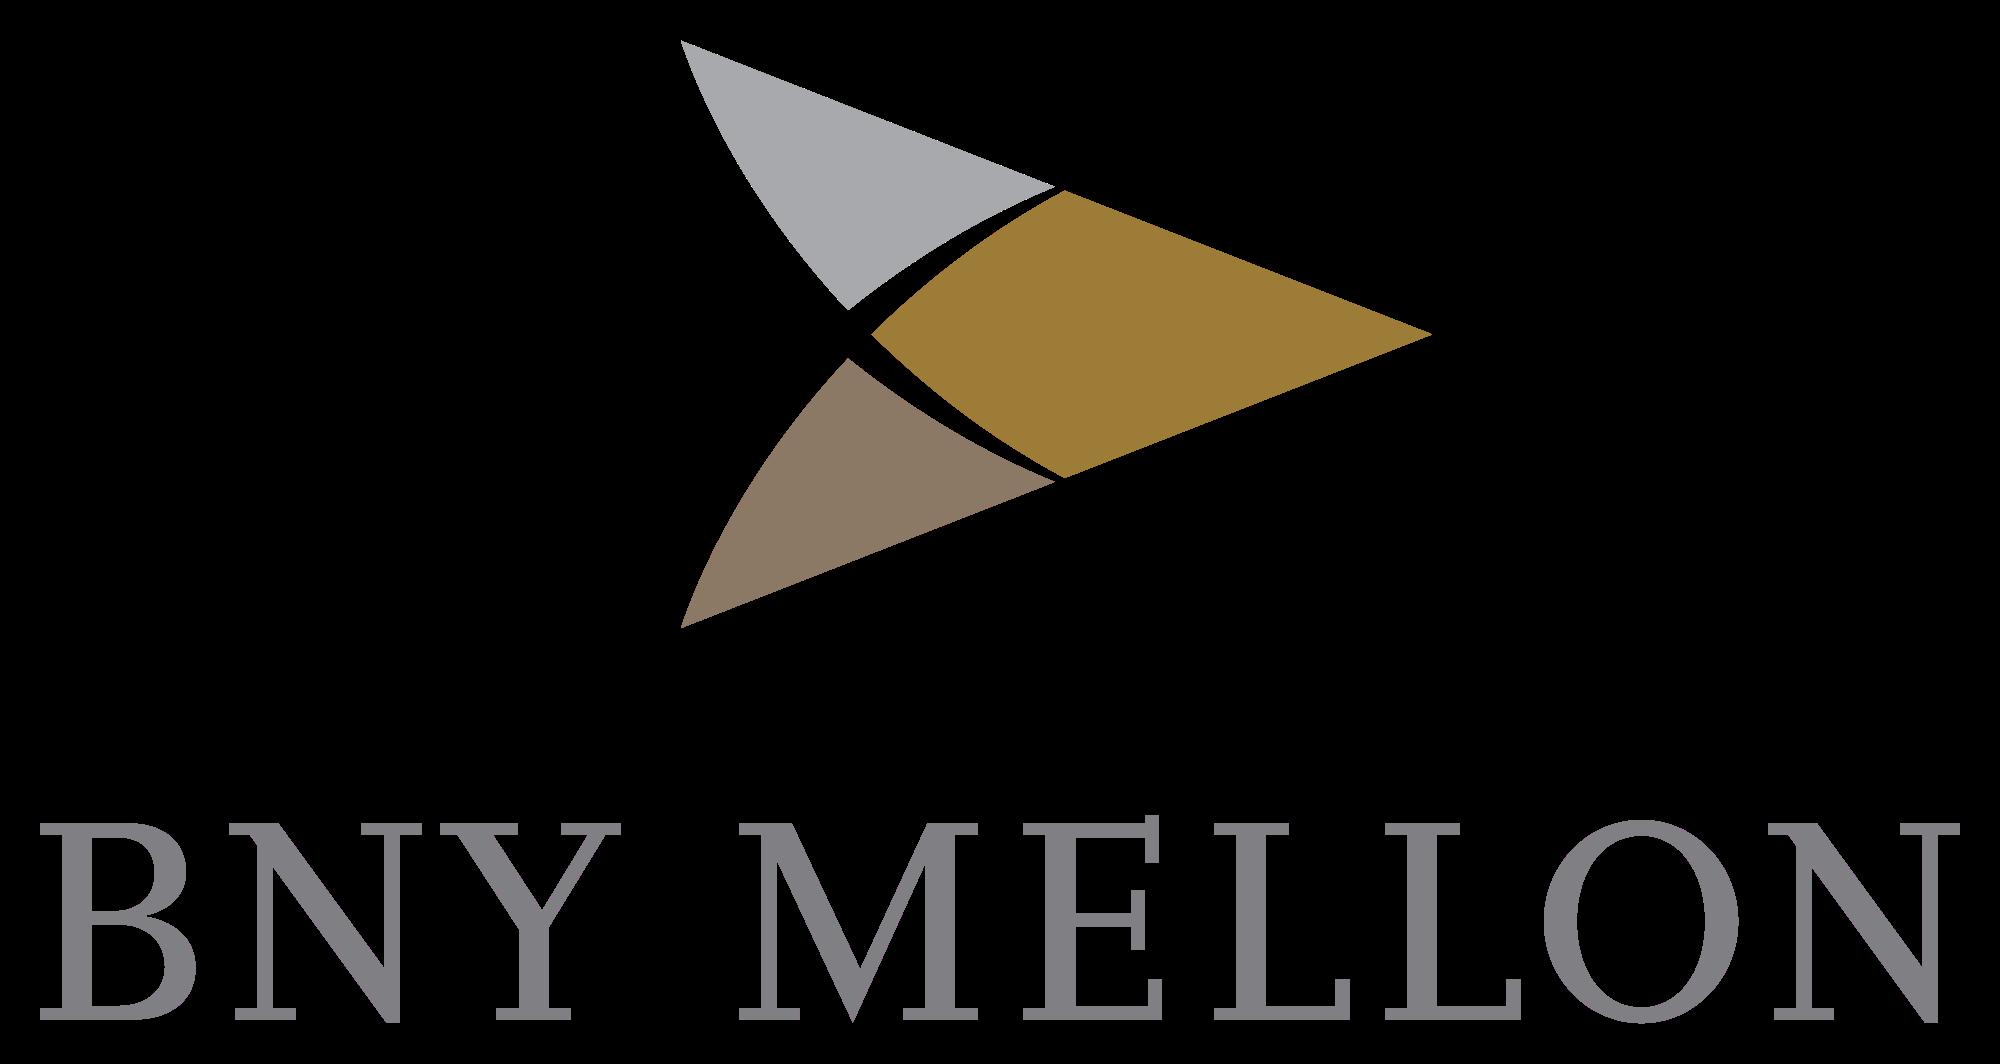 BANK OF NEW YORK Logo photo - 1